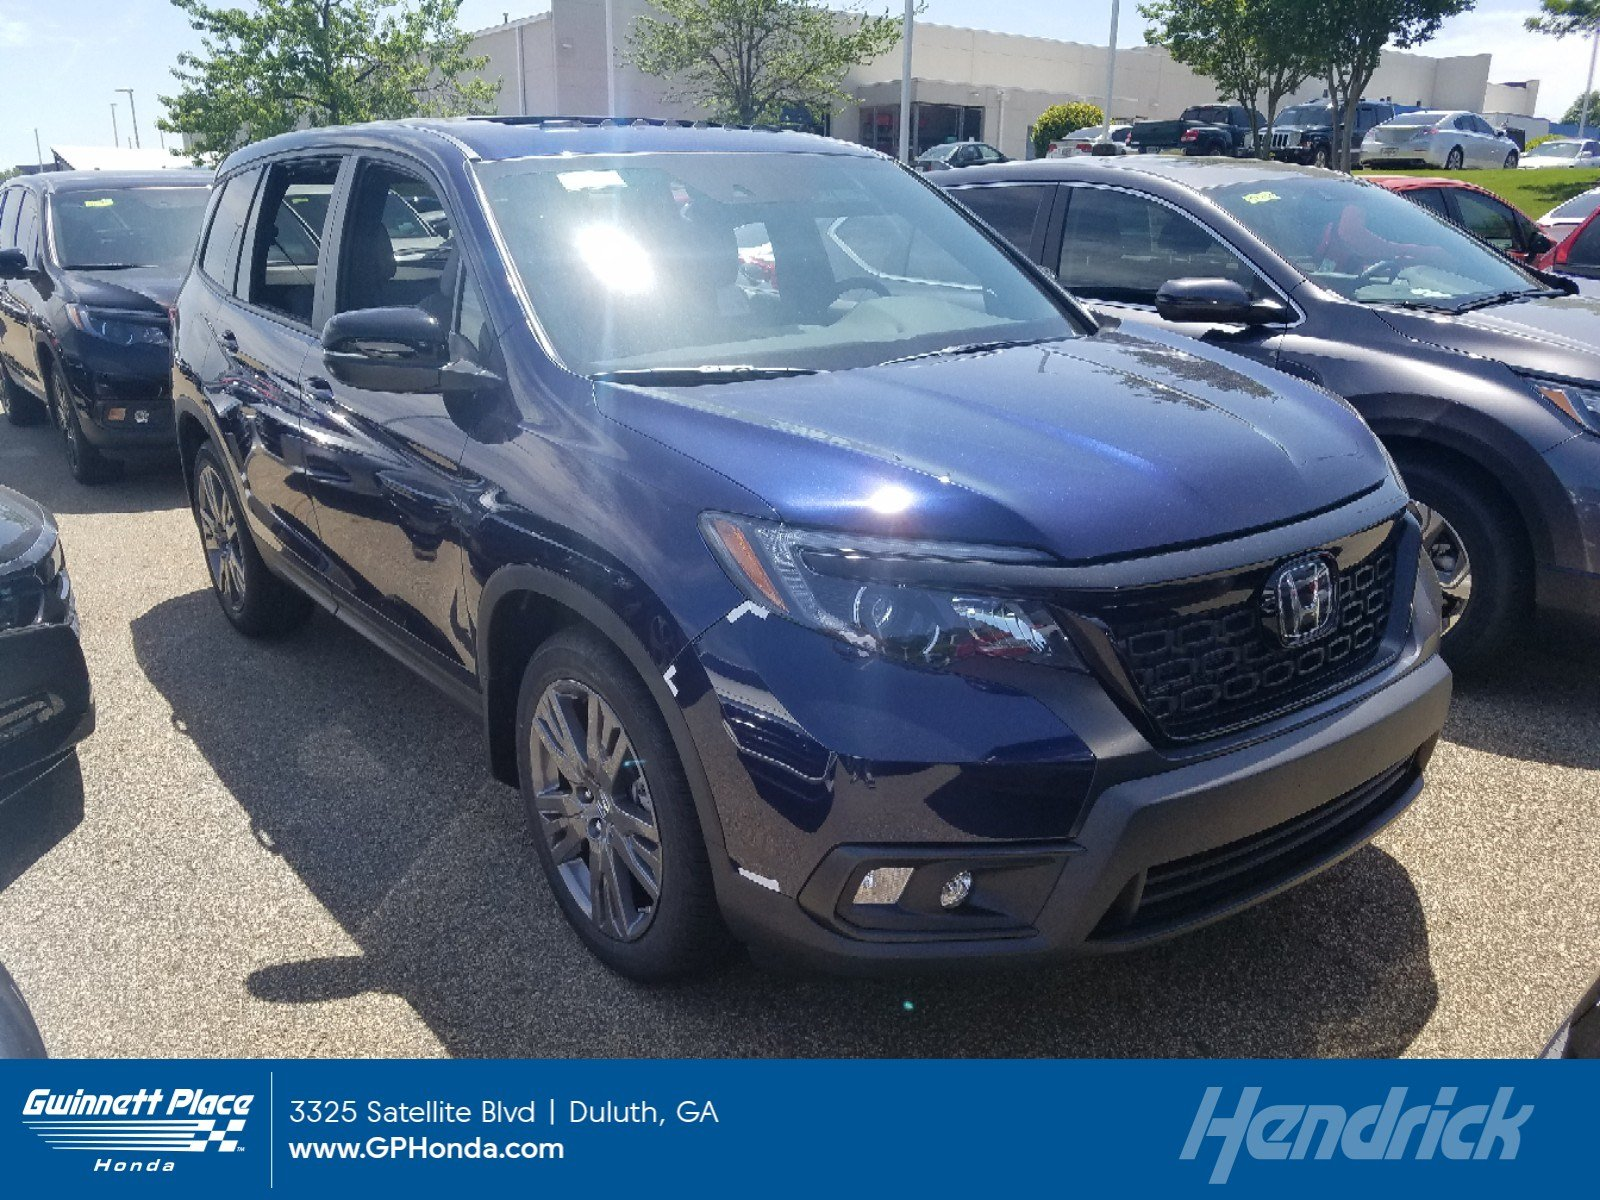 New 2019 Honda Passport EX-L FWD SUV for sale in Duluth, GA